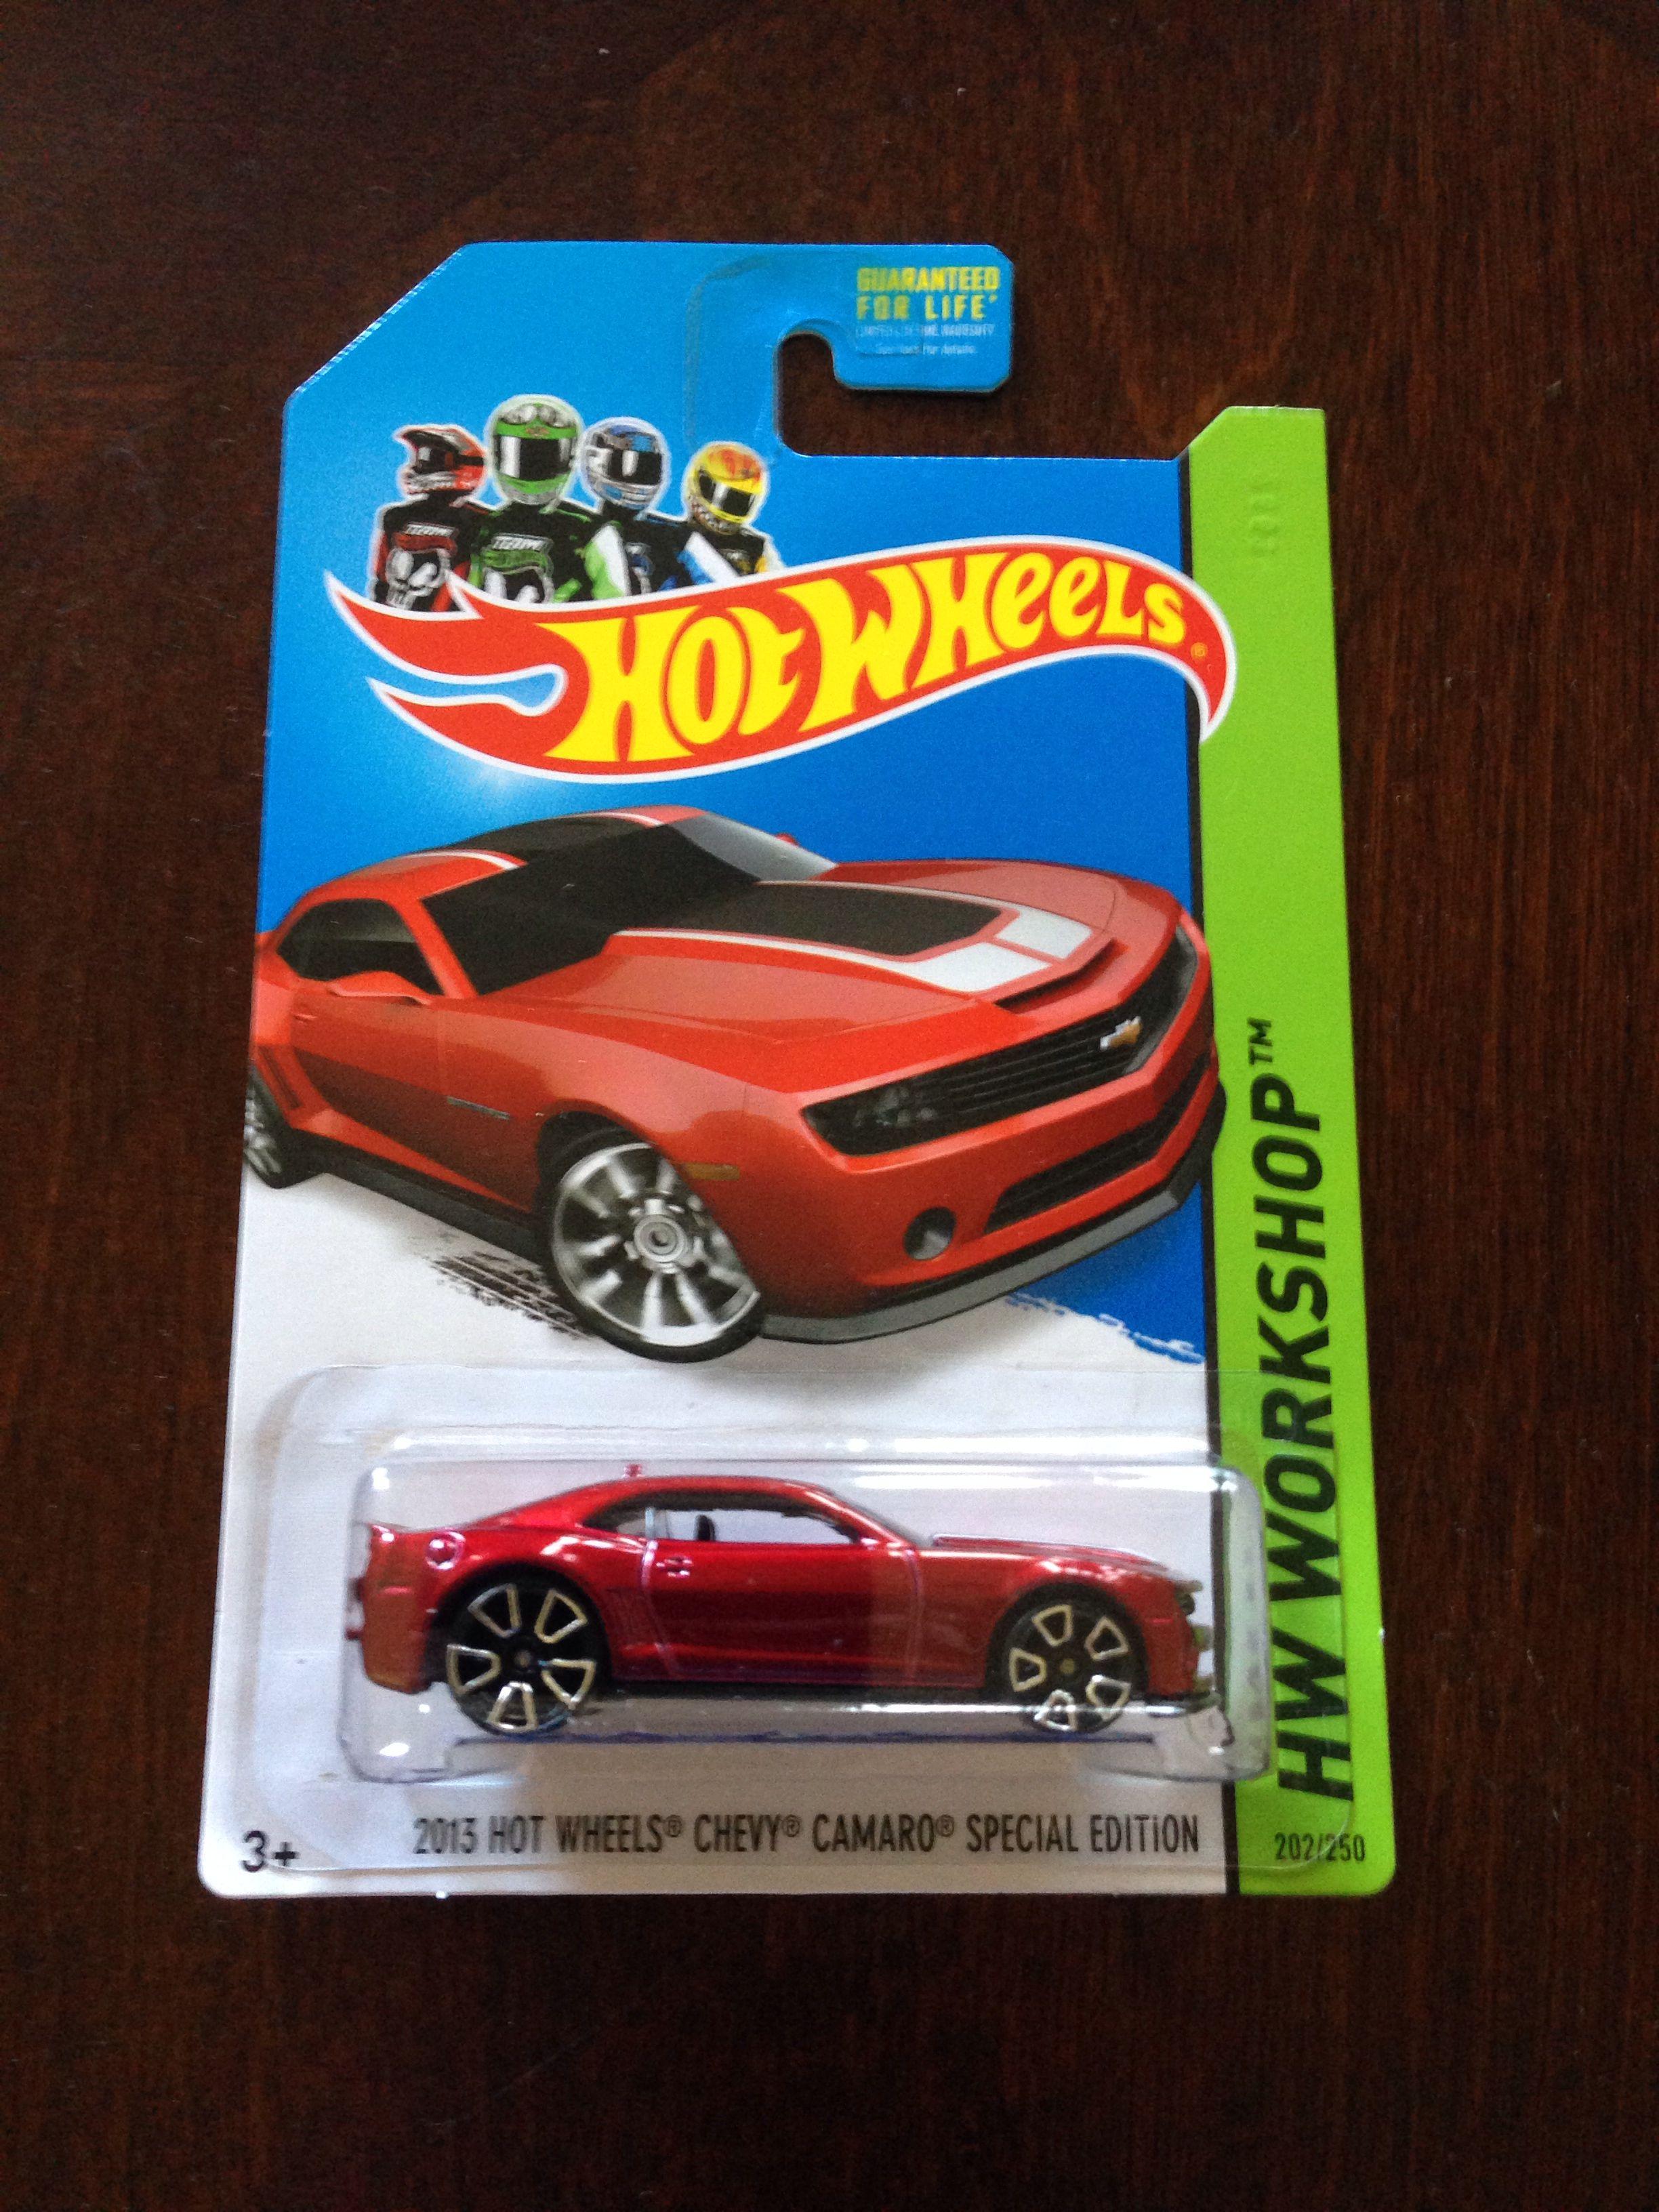 Hotwheels Chevy Camaro Special Edition Hot Wheels Hot Wheels Cars Chevy Camaro